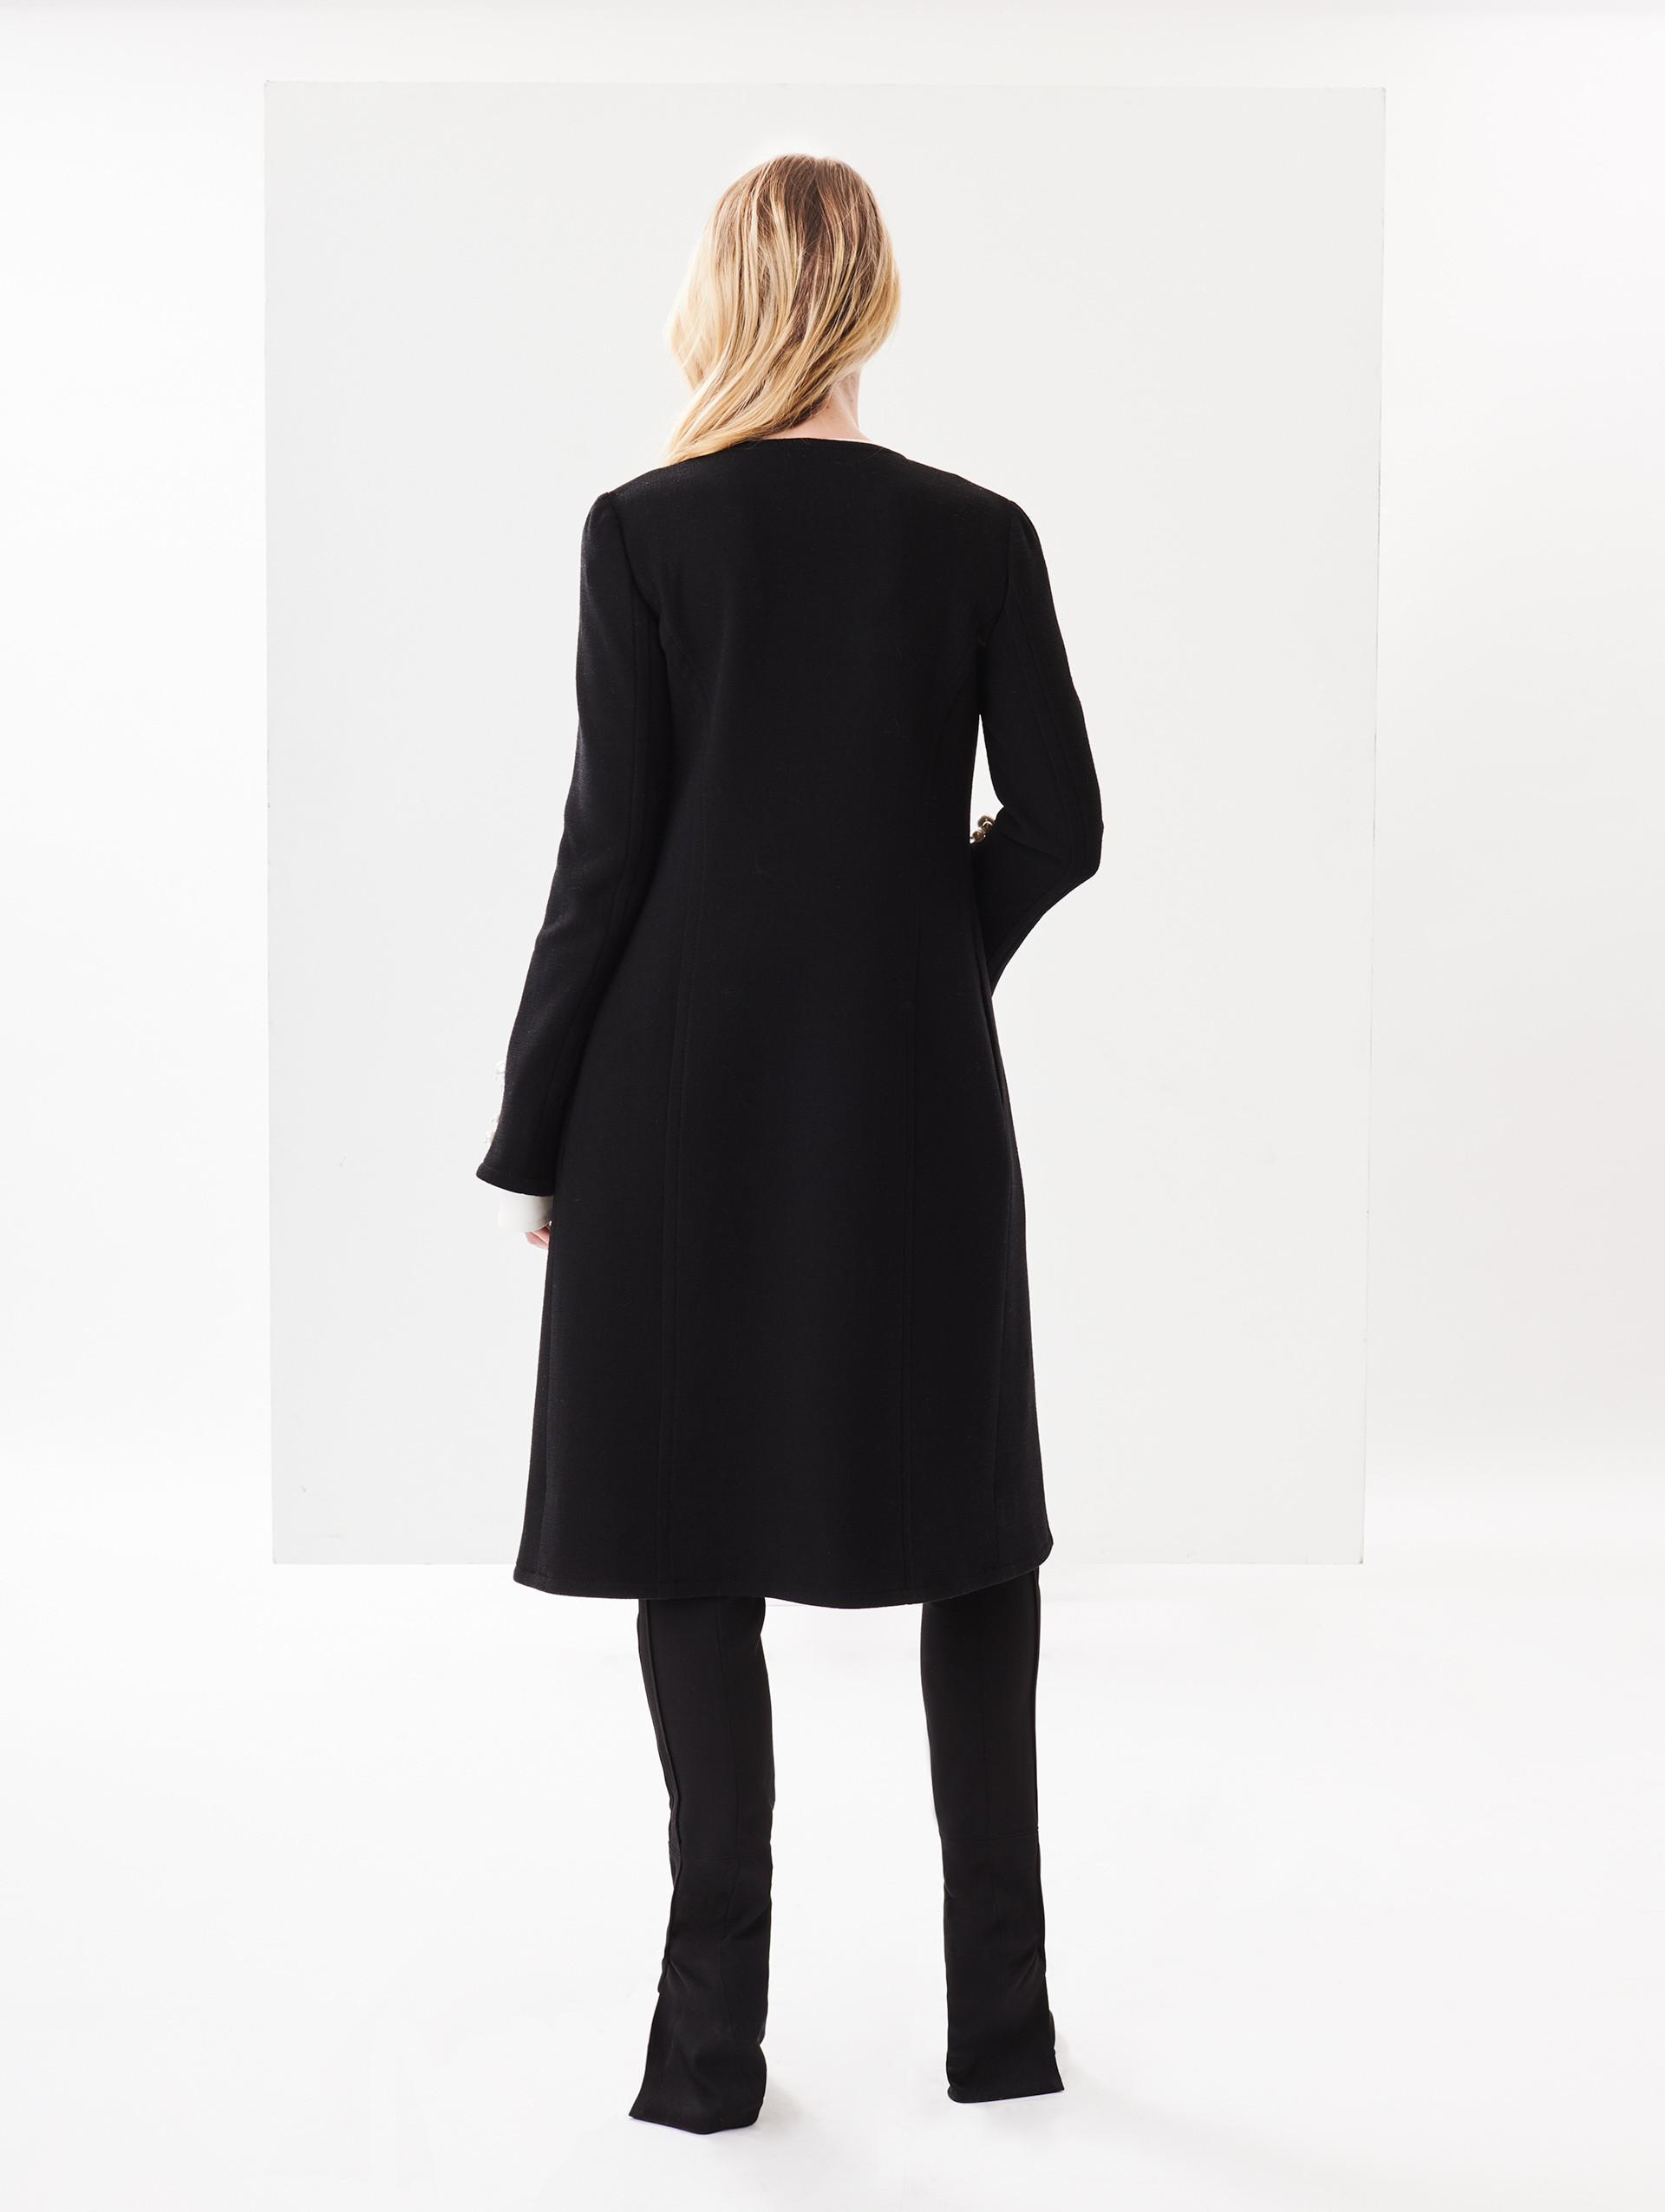 Stretch Embroidered Pearl Wool Crepe Renta De In La Lyst Black Coat Oscar 4wUgqxf